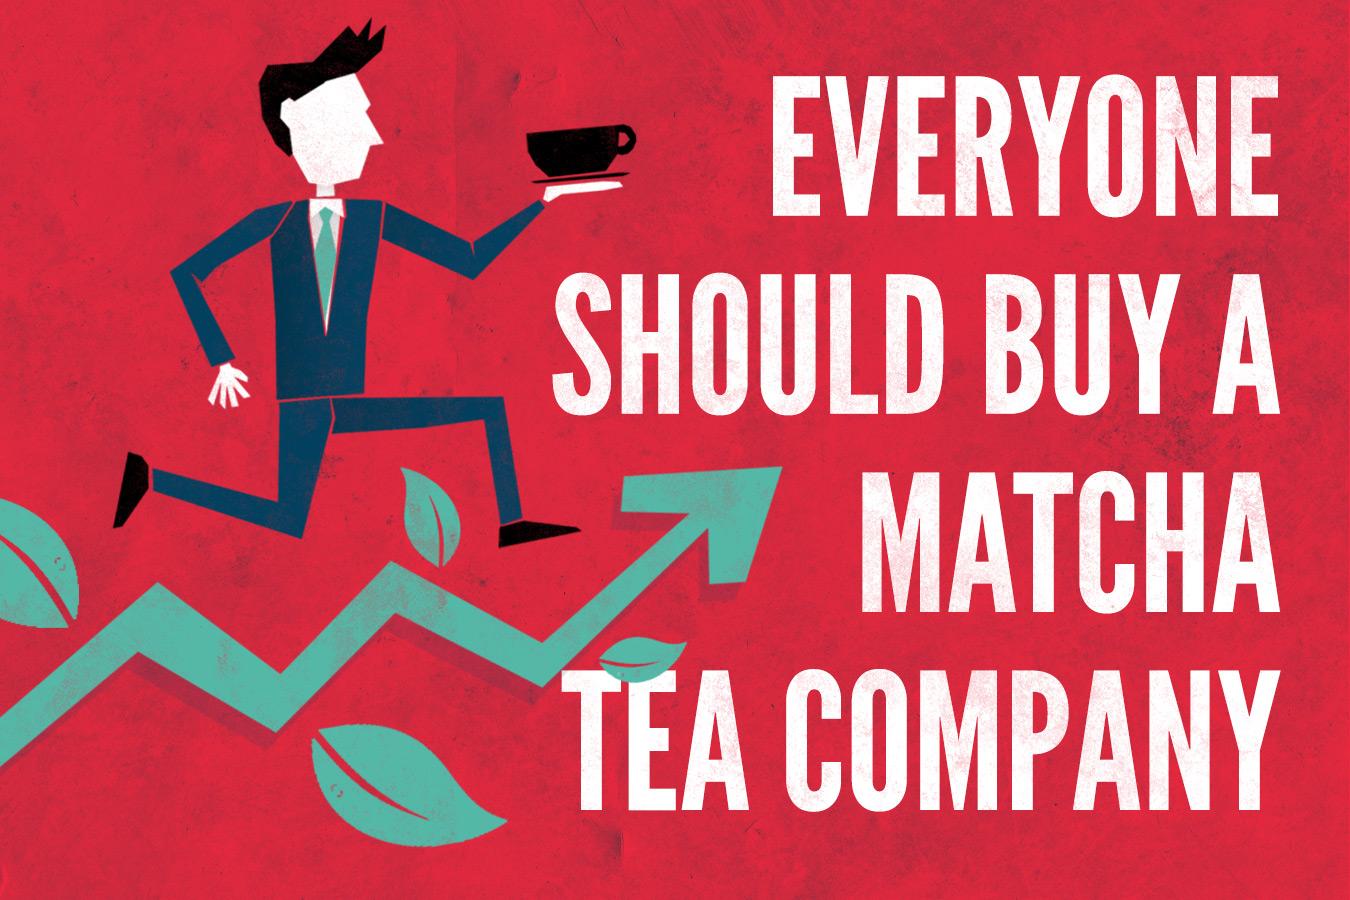 Why Everyone Should buy a Matcha Tea Company